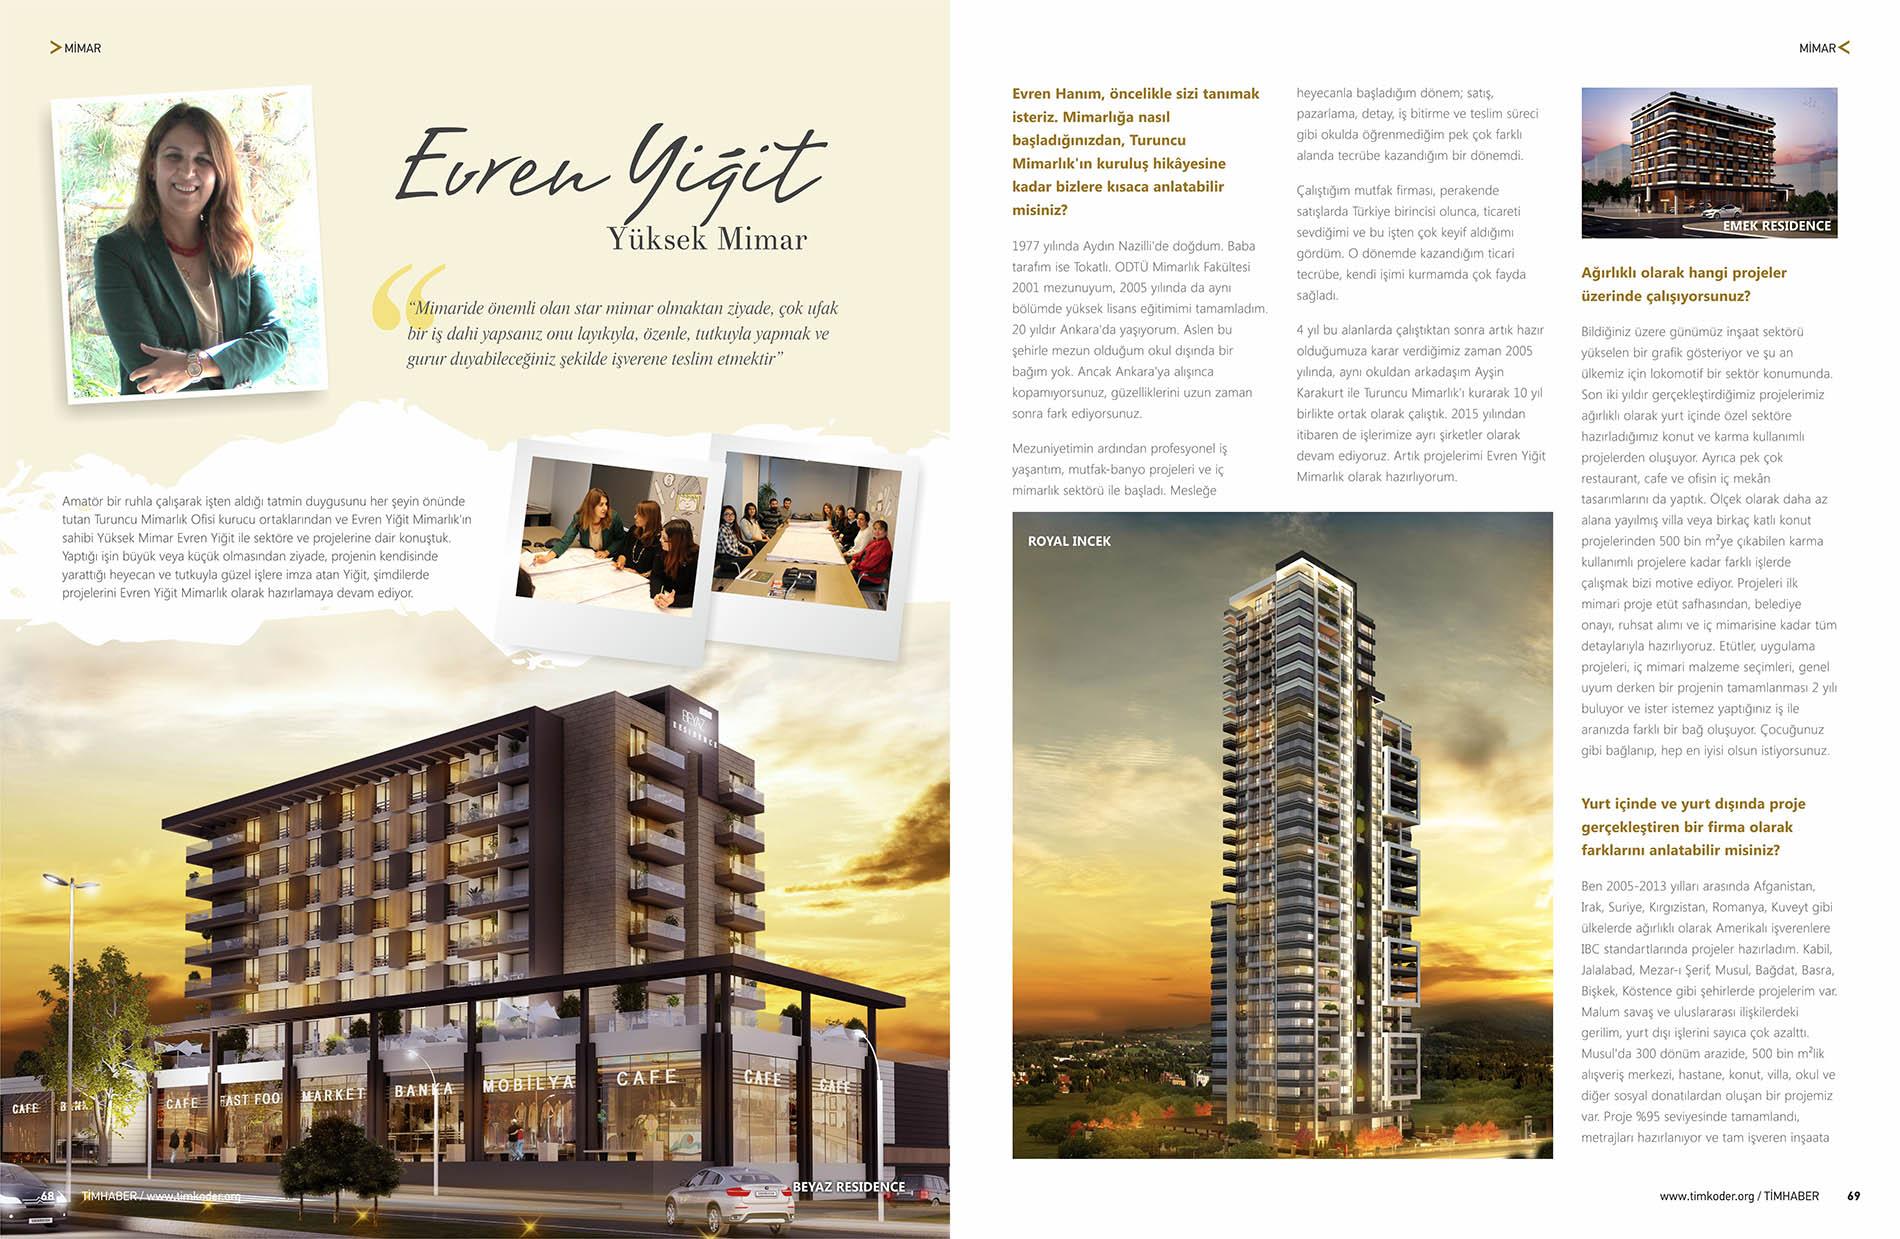 Evren Yiğit | TimHaber Magazine interviewed Evren Yiğit on its TIMKODER-KOSGEB Project Special Issue | Sıradışı Digital